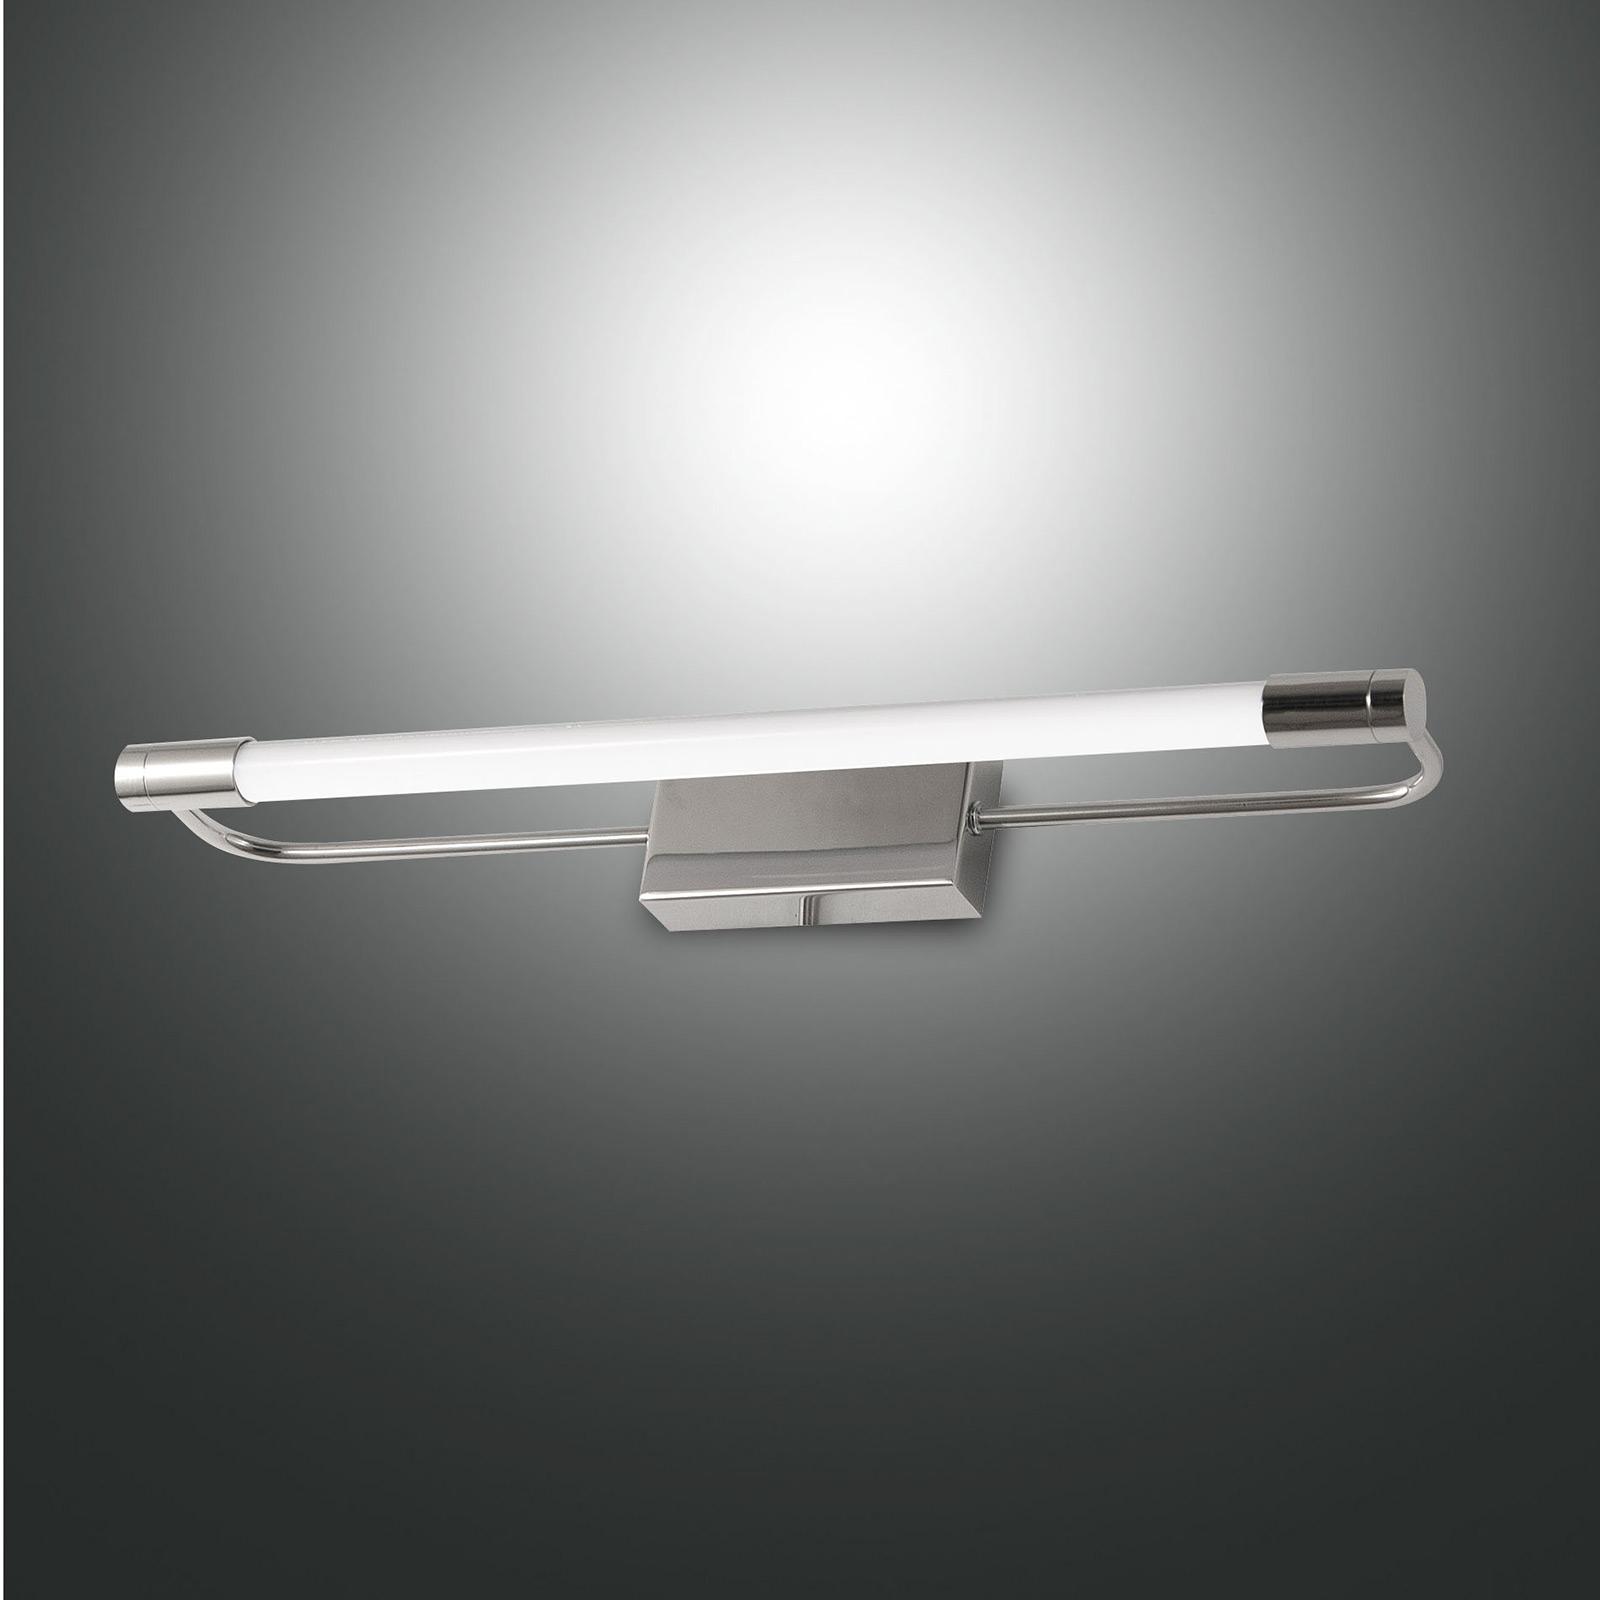 Rapallo LED wall light, chrome, IP44_3502731_1